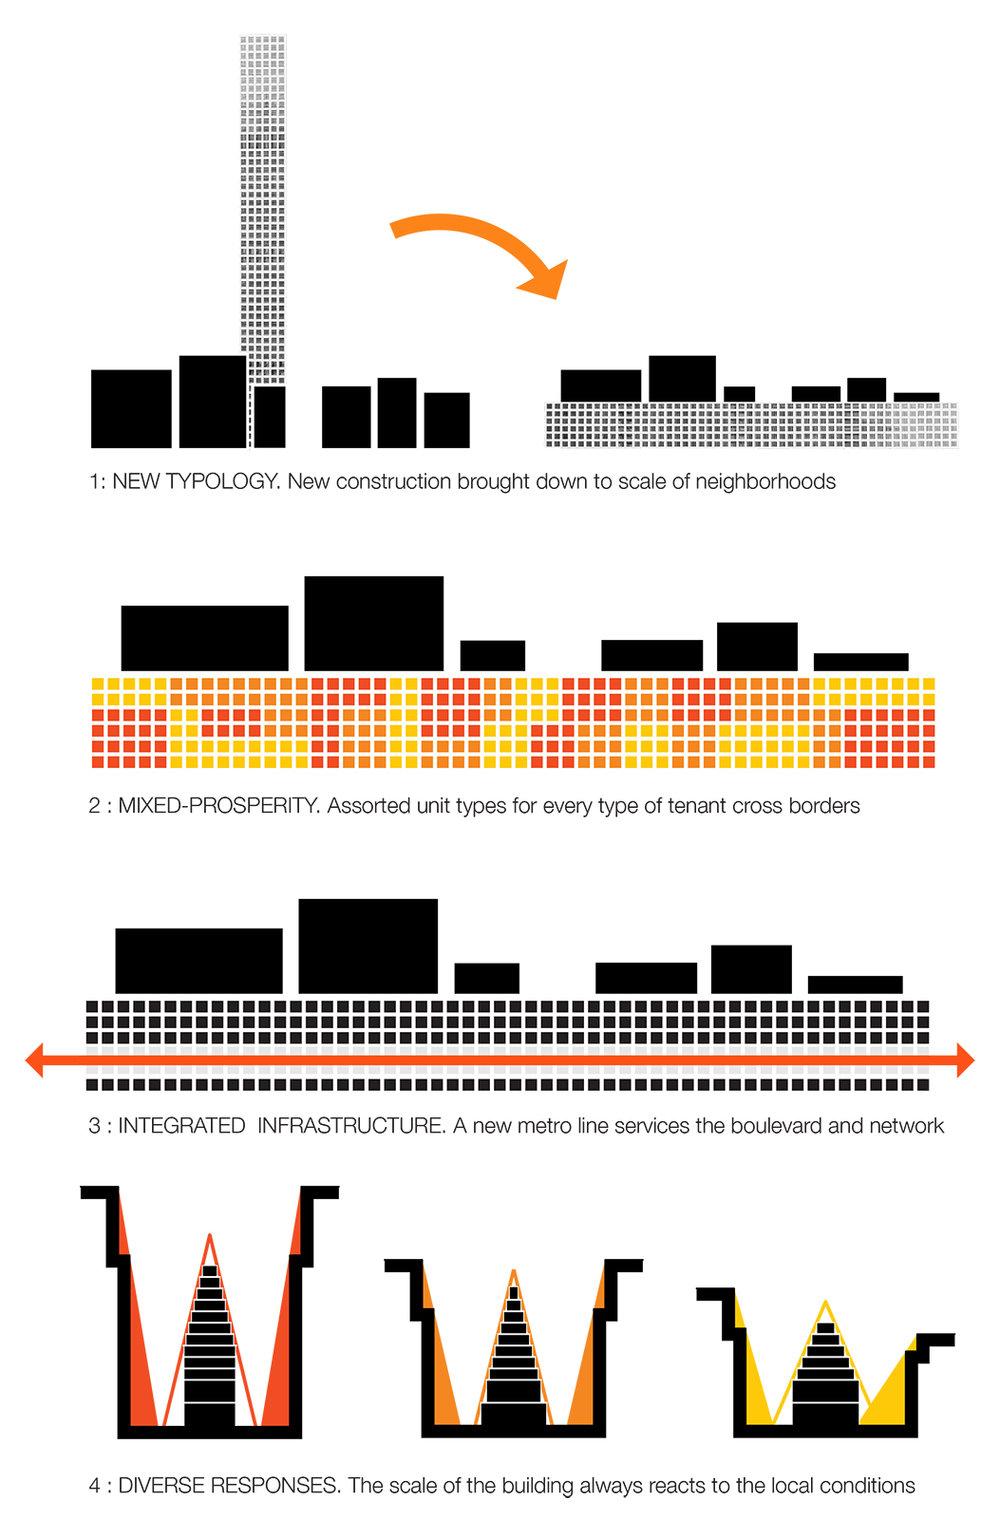 fantasticoffense_infrastructuralinfill_concept_diagram.jpg